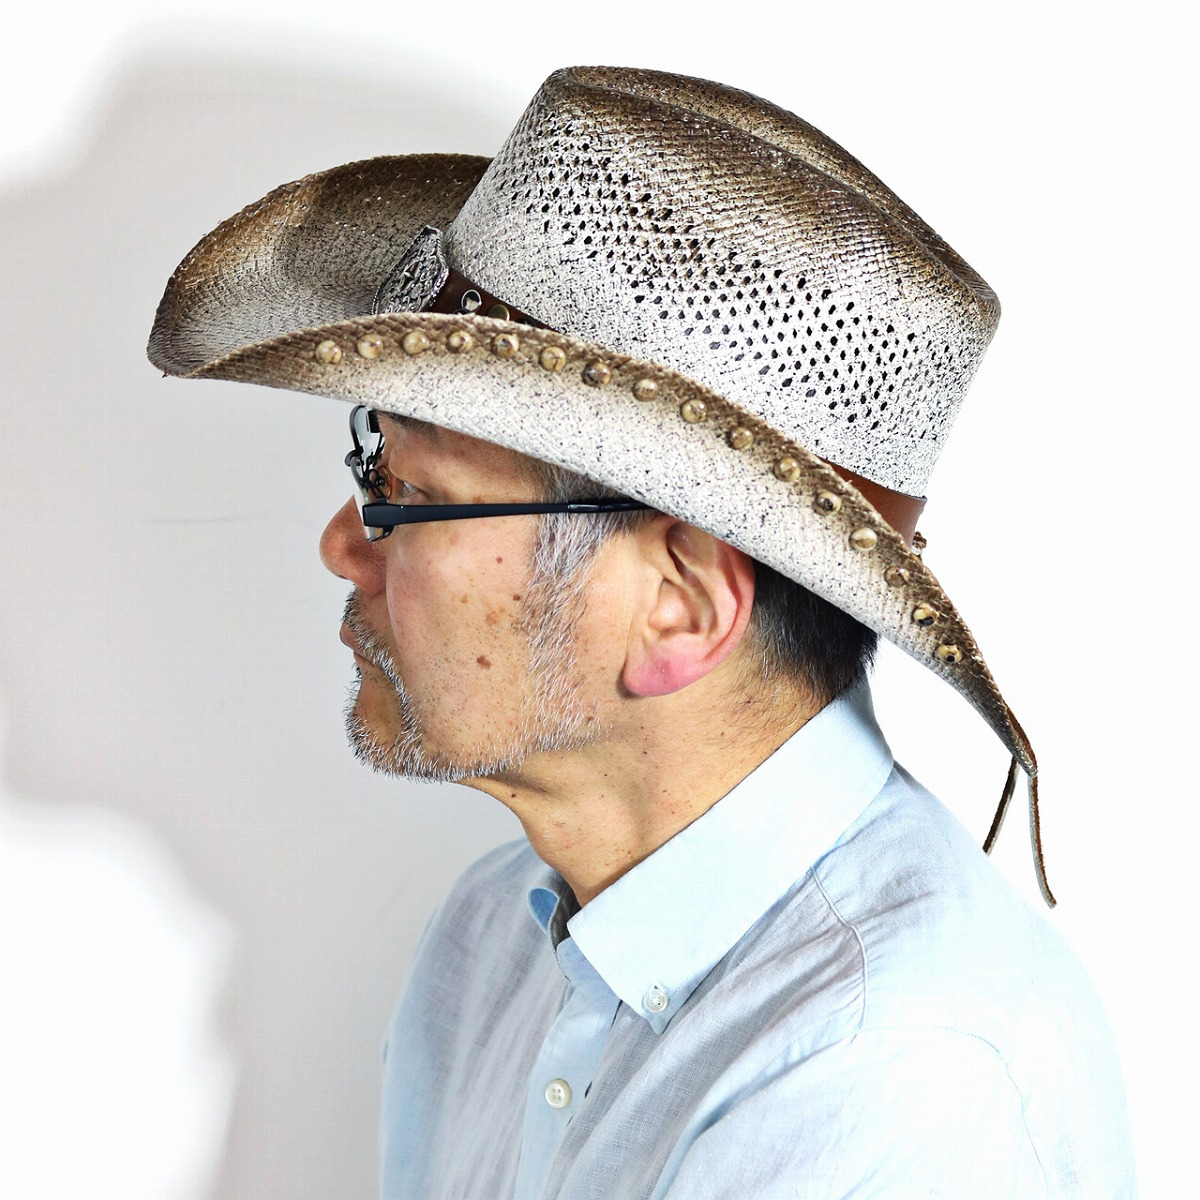 Natural. A brand California Hat Company Inc. Panama hat western hat  California Hat Company Inc. California hat high quality ten gallon ... 0dd063cf11dd